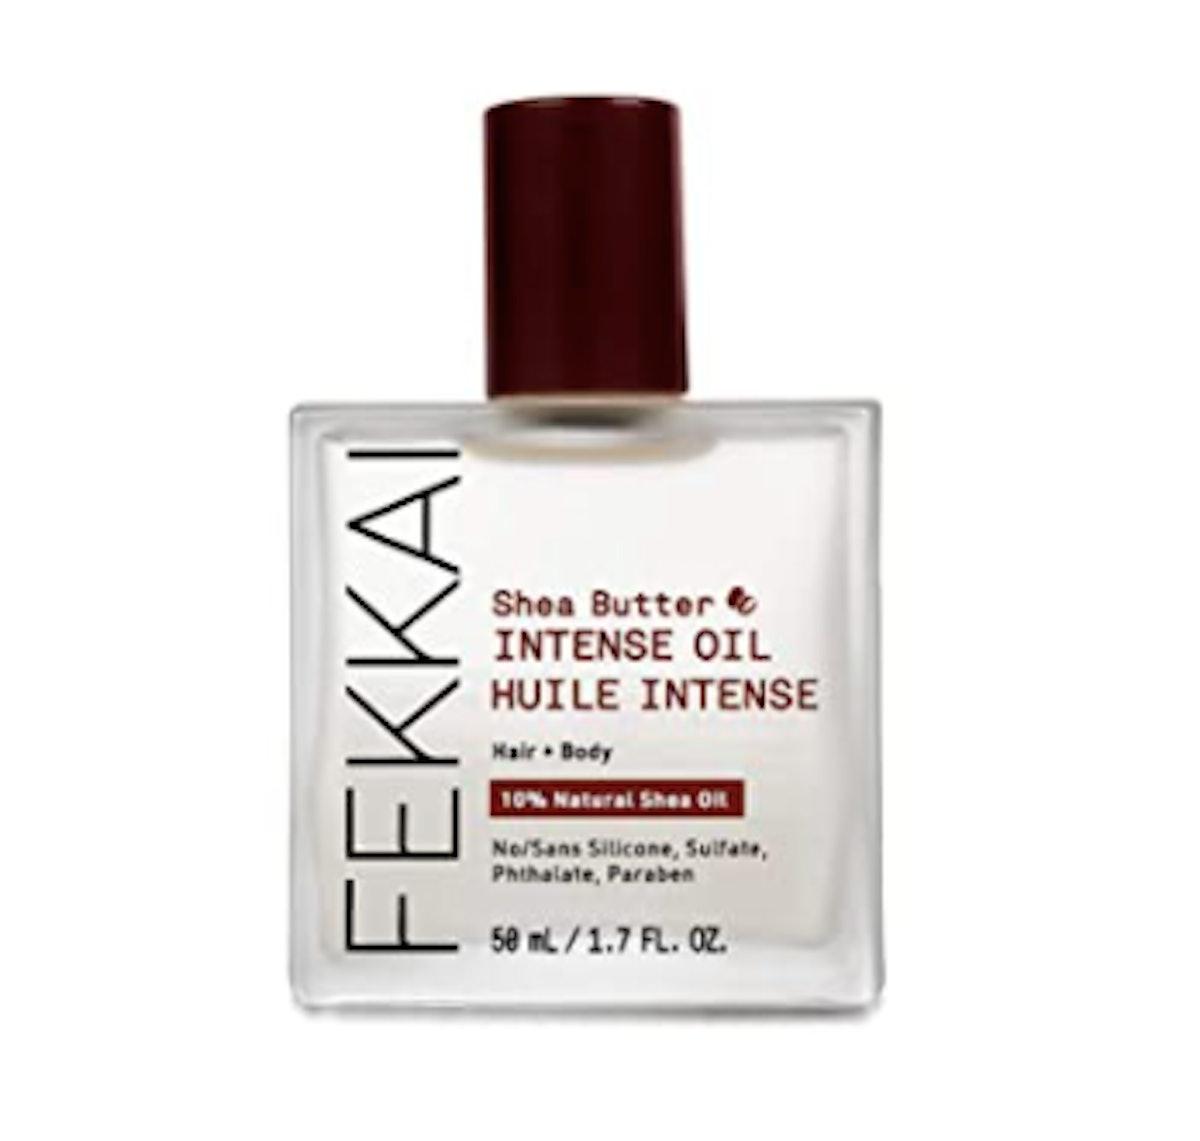 Fekkai Shea Butter Intense Oil